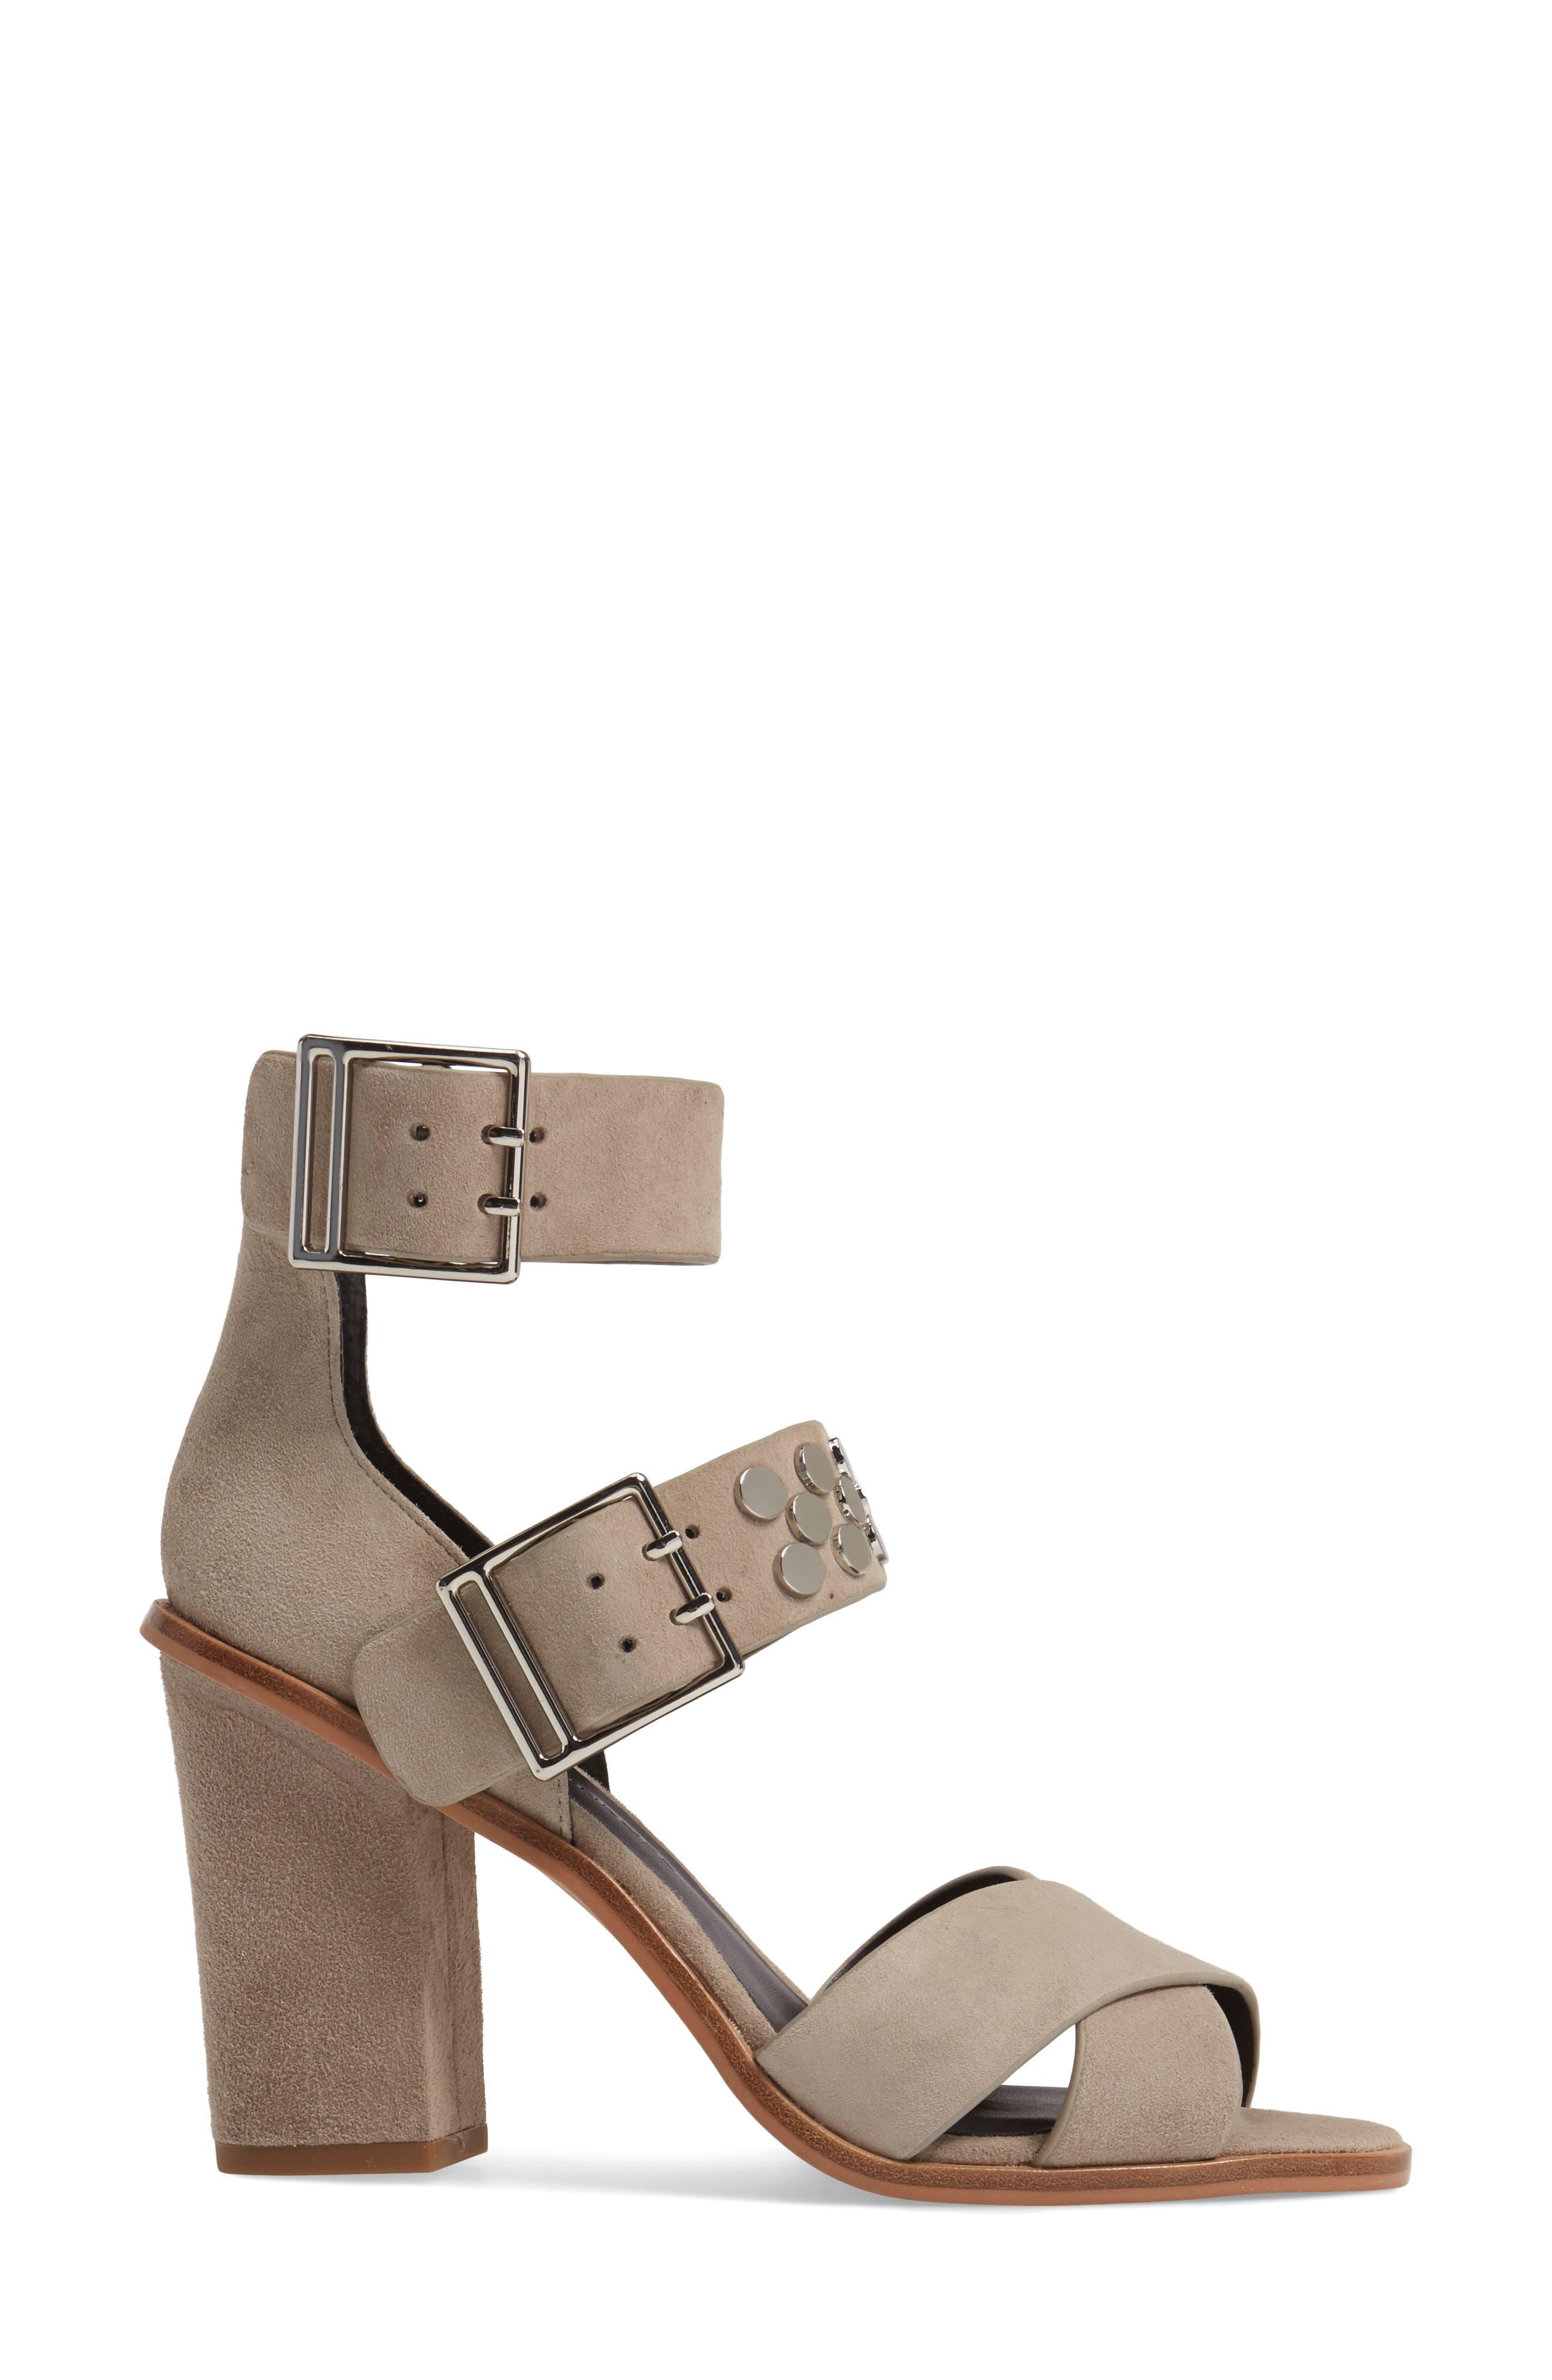 Jennifer Studded Ankle Cuff Sandal,                             Alternate thumbnail 8, color,